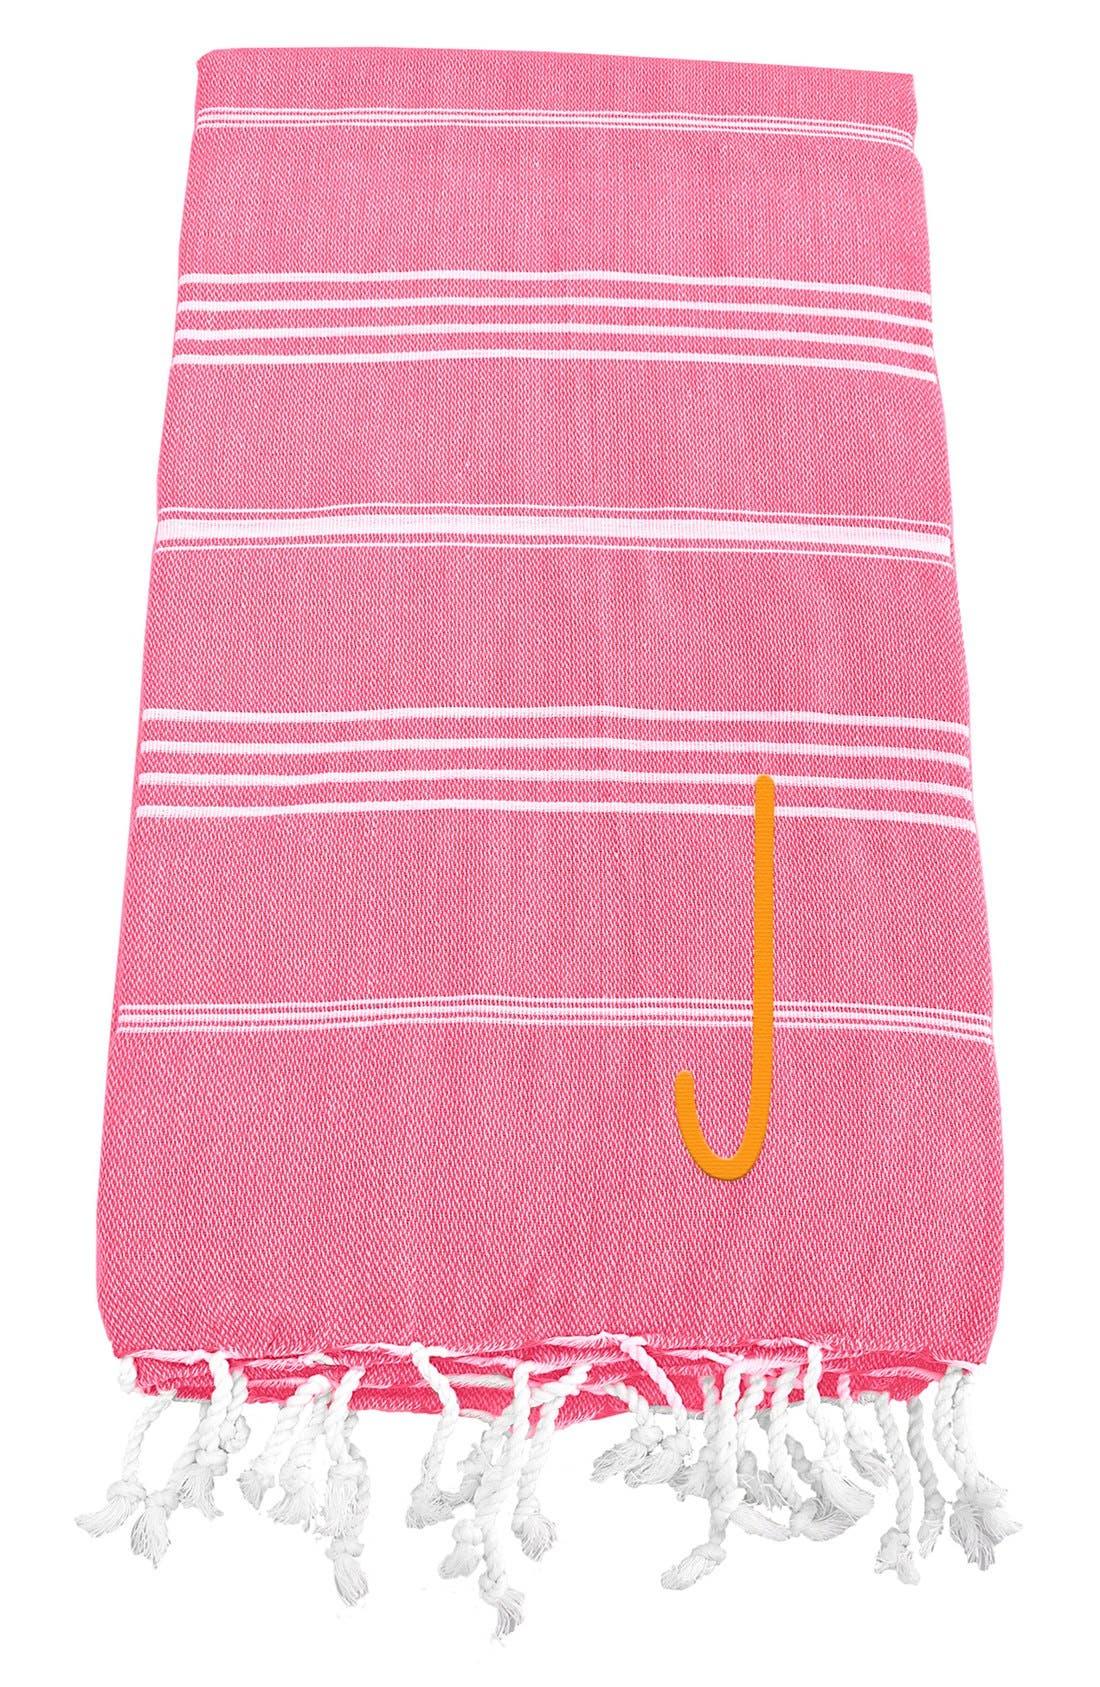 Monogram Turkish Cotton Towel,                             Main thumbnail 146, color,